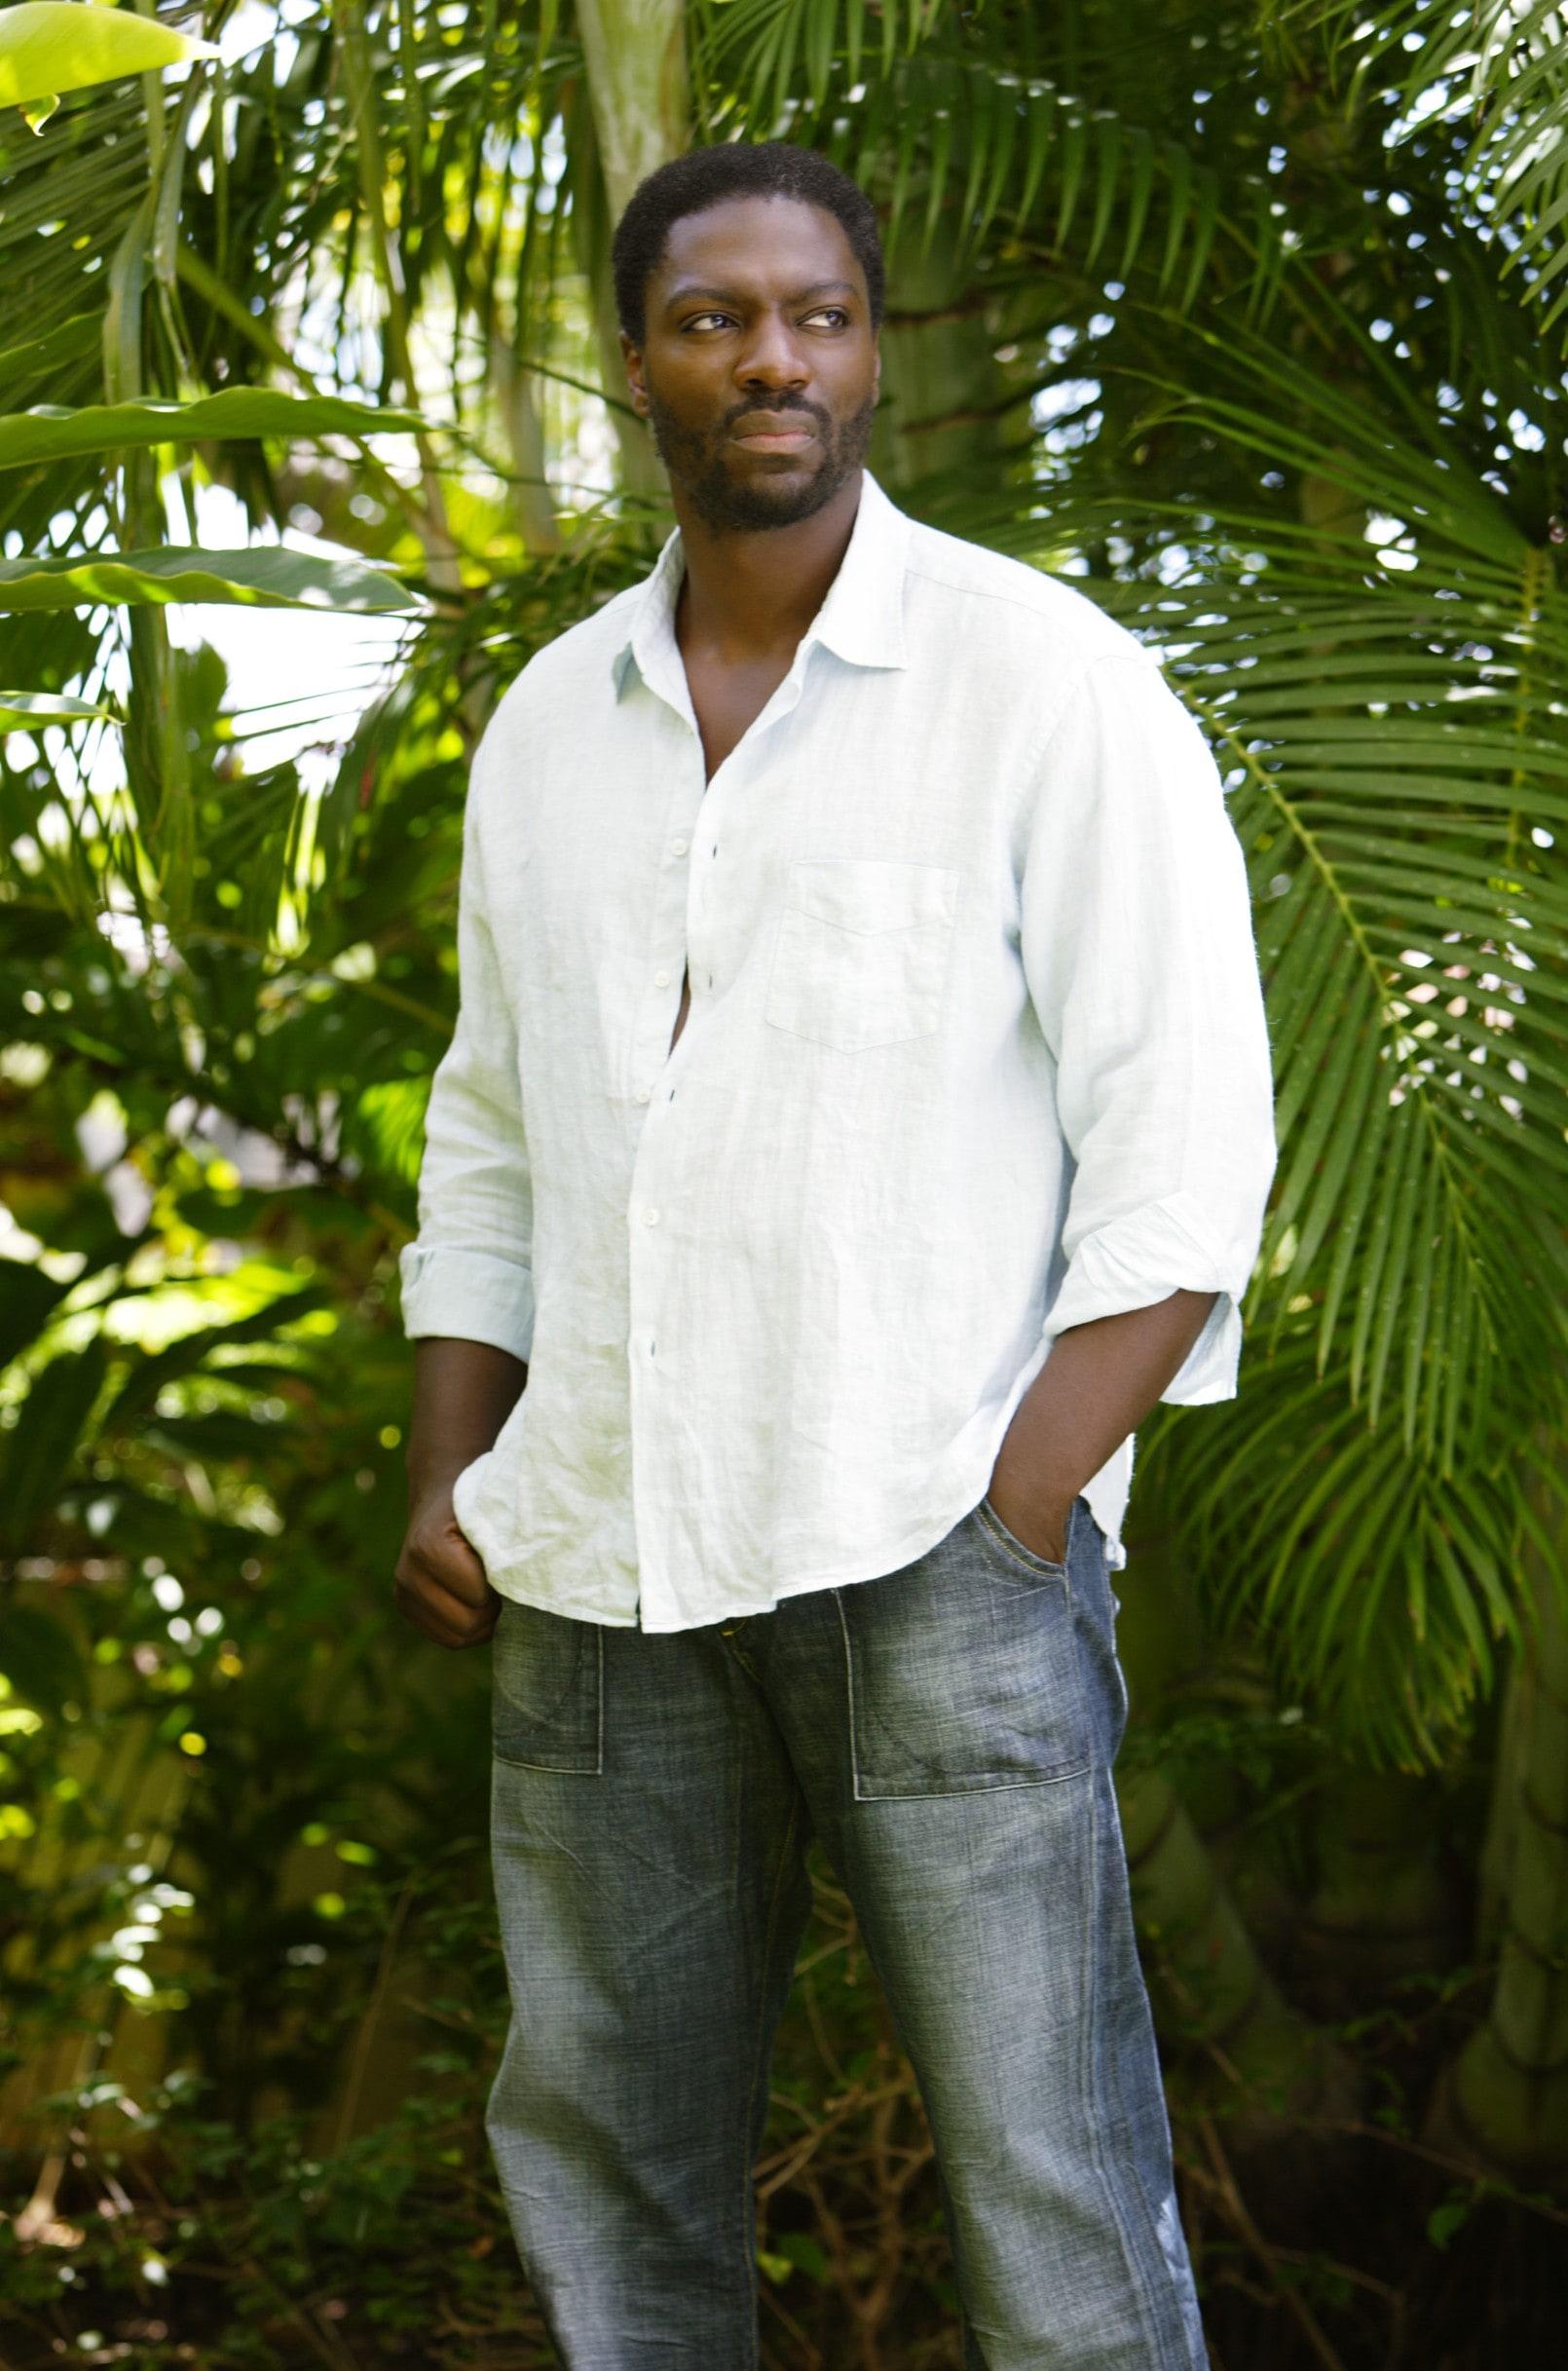 Adewale Akinnuoye-Agbaje Backgrounds